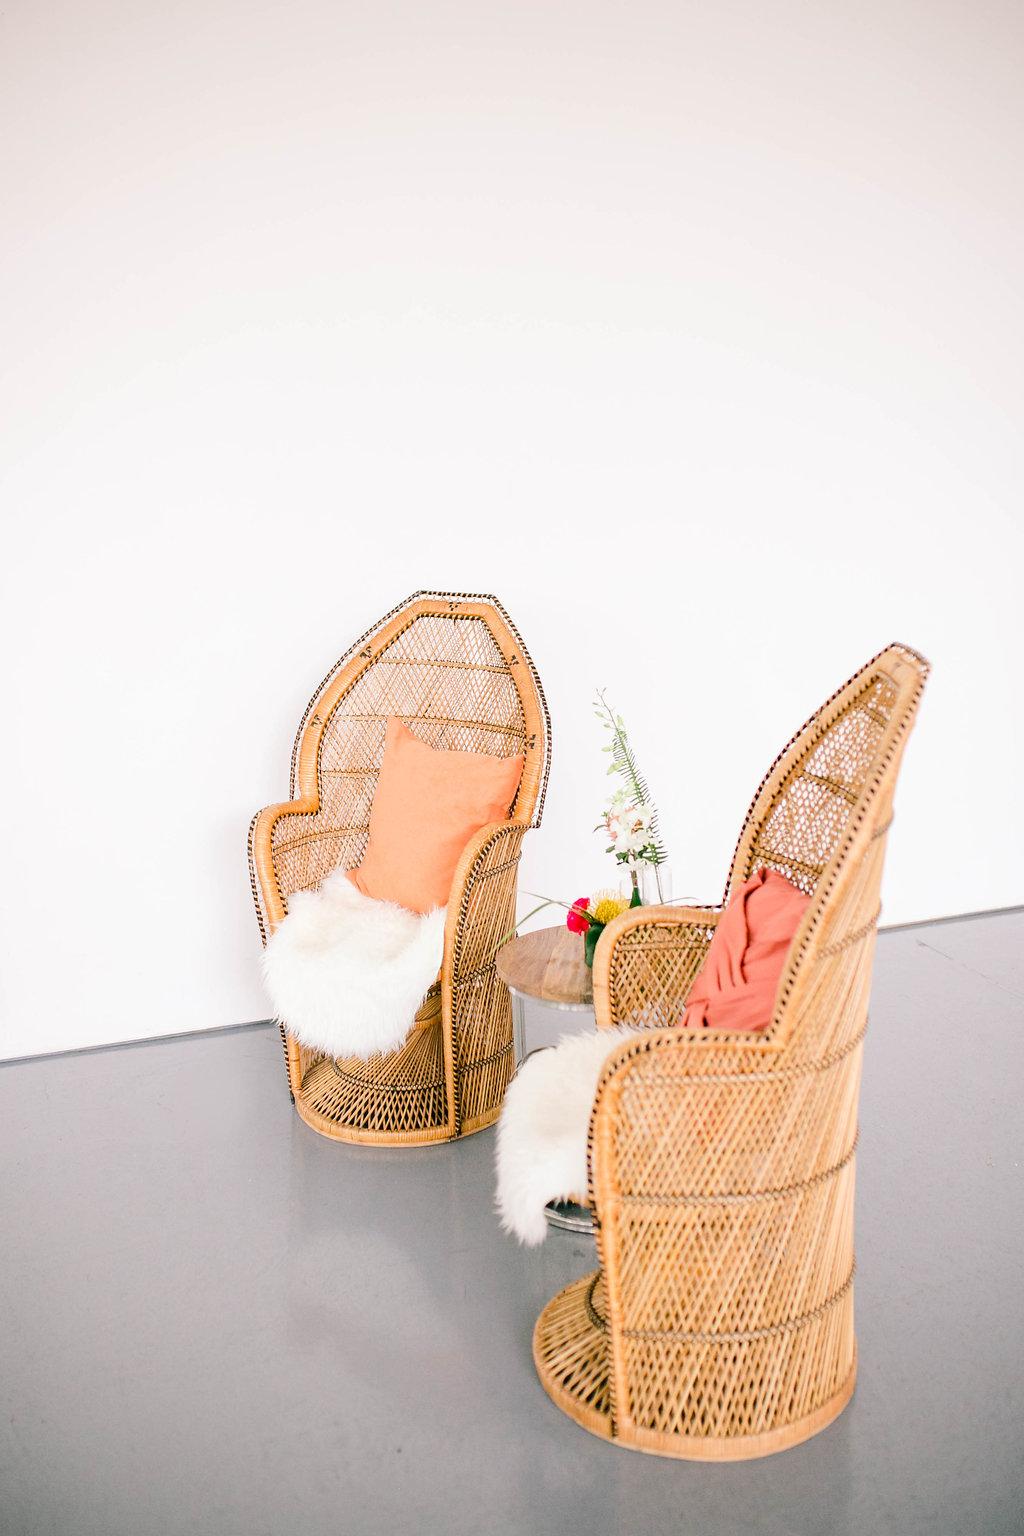 Retro peacock chairs / Art Gallery of Hamilton